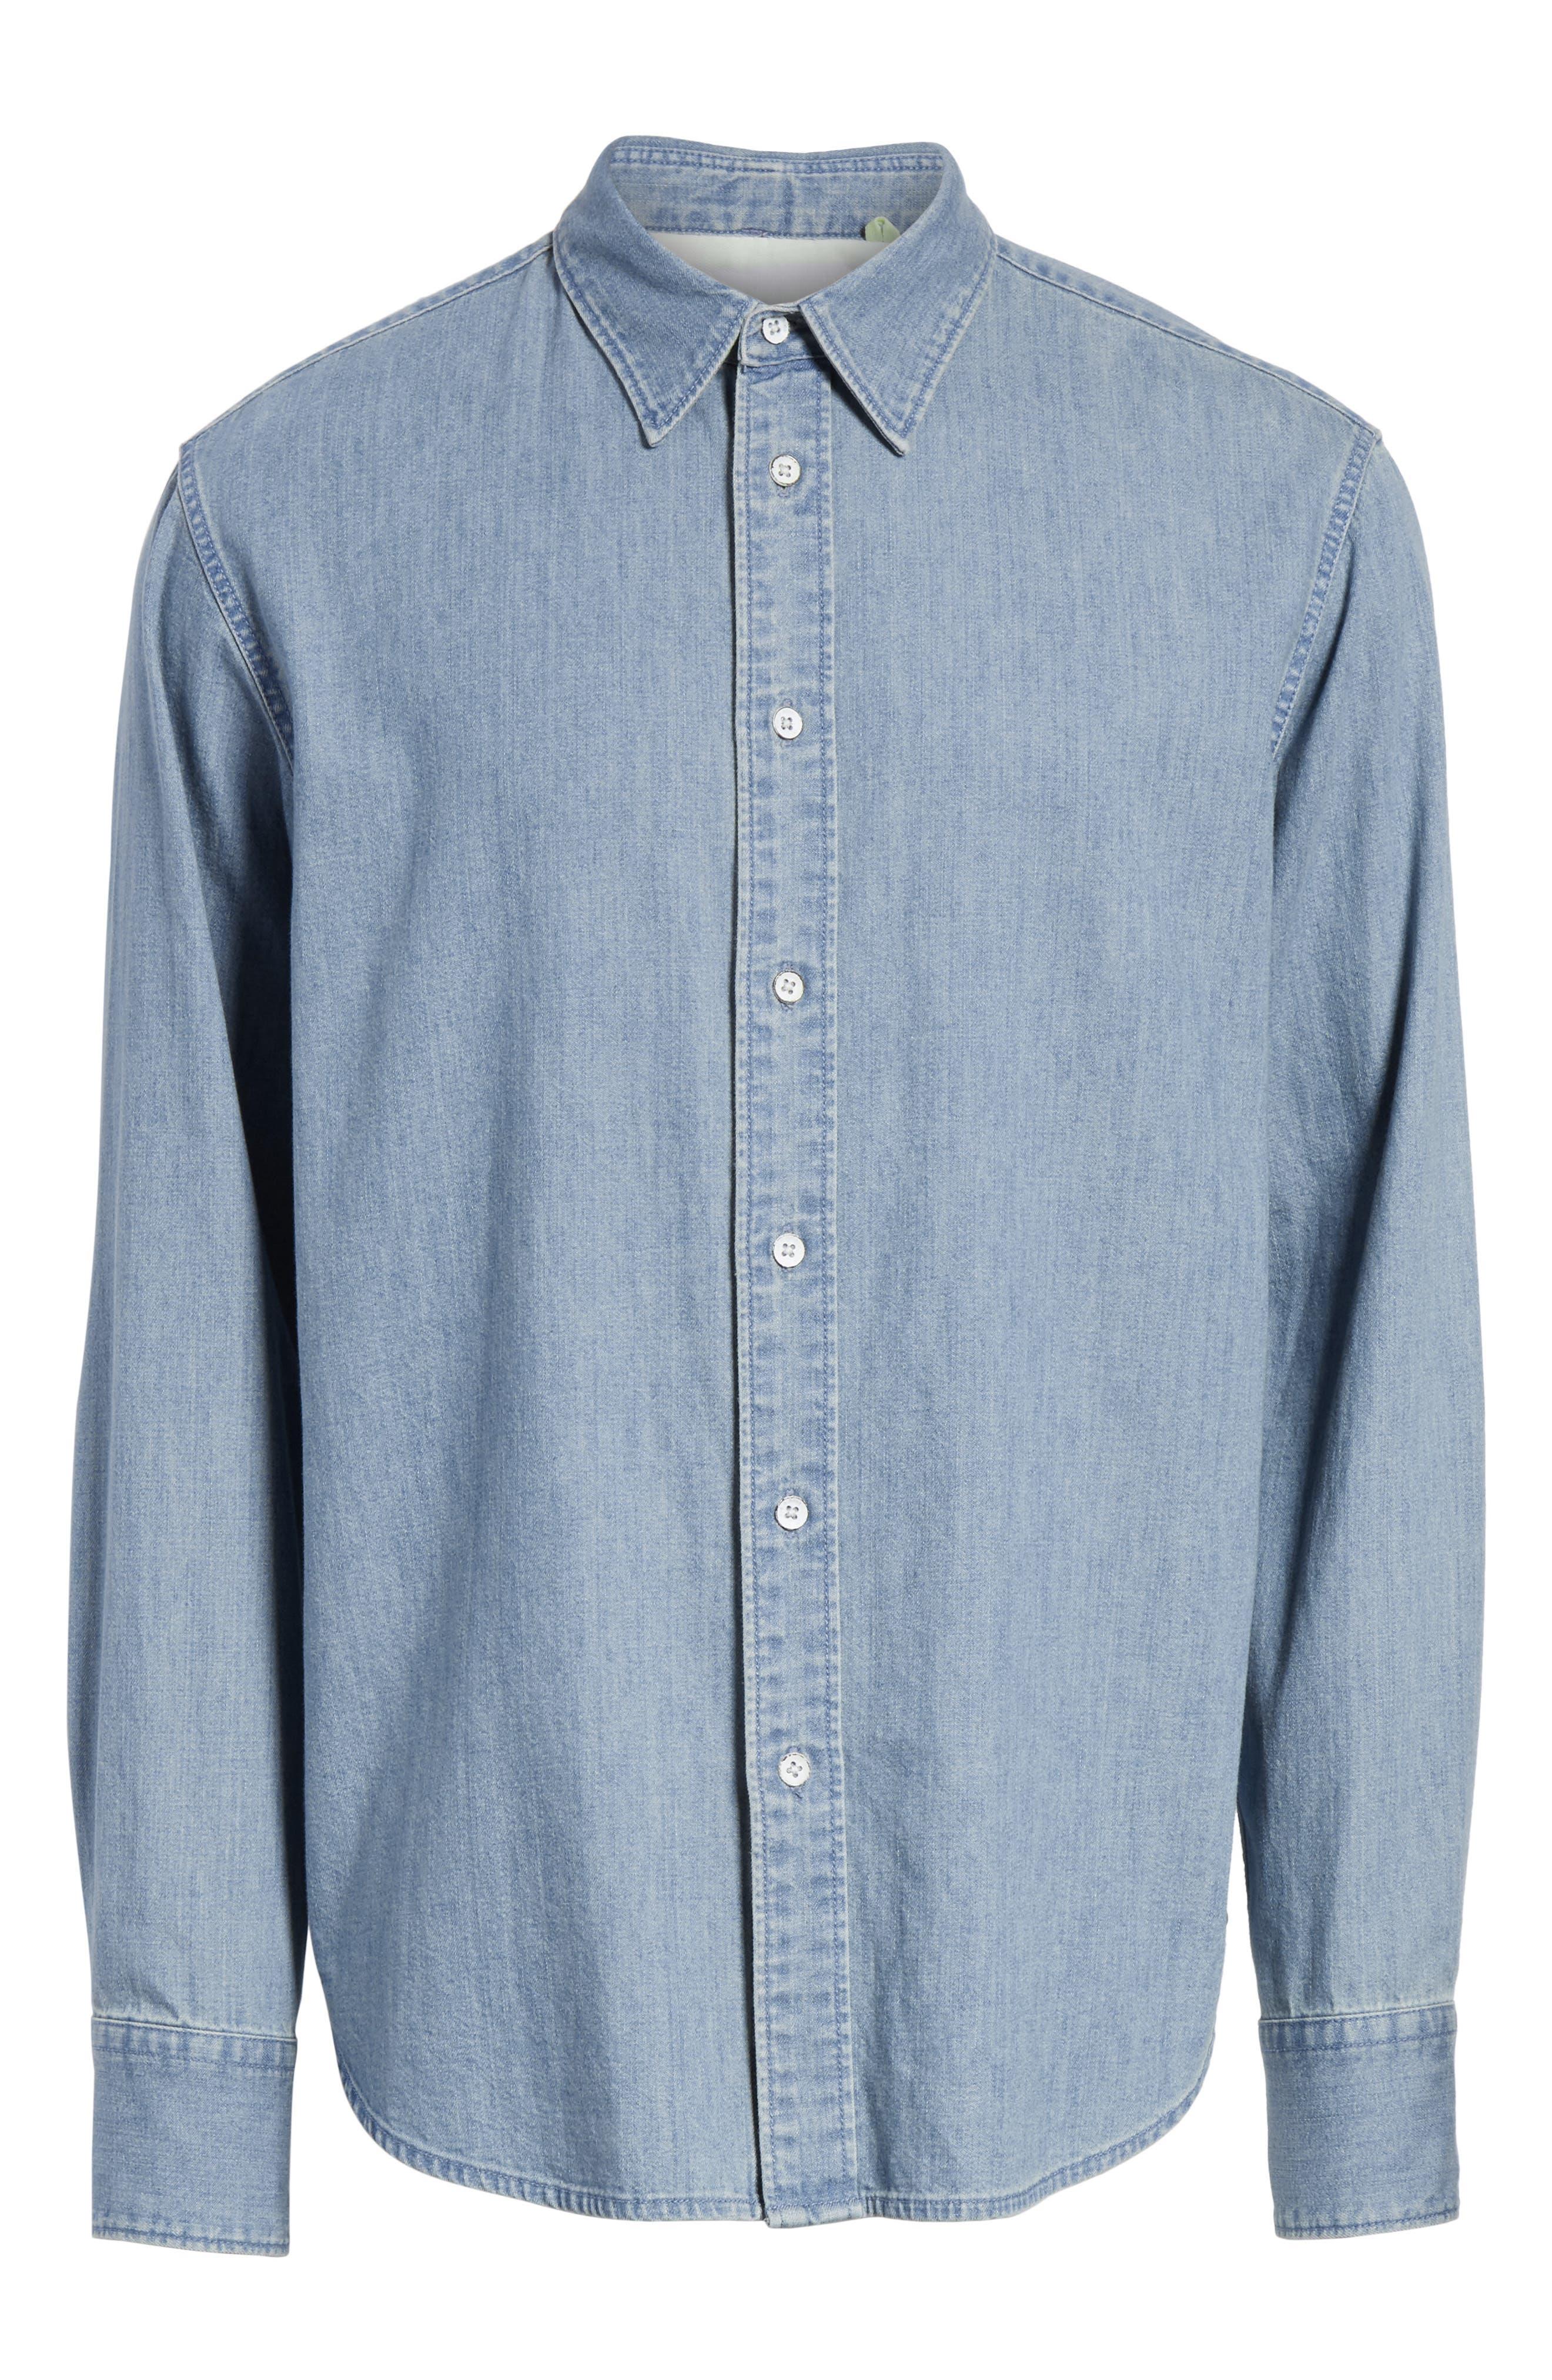 Fit 3 Chambray Denim Shirt,                             Alternate thumbnail 6, color,